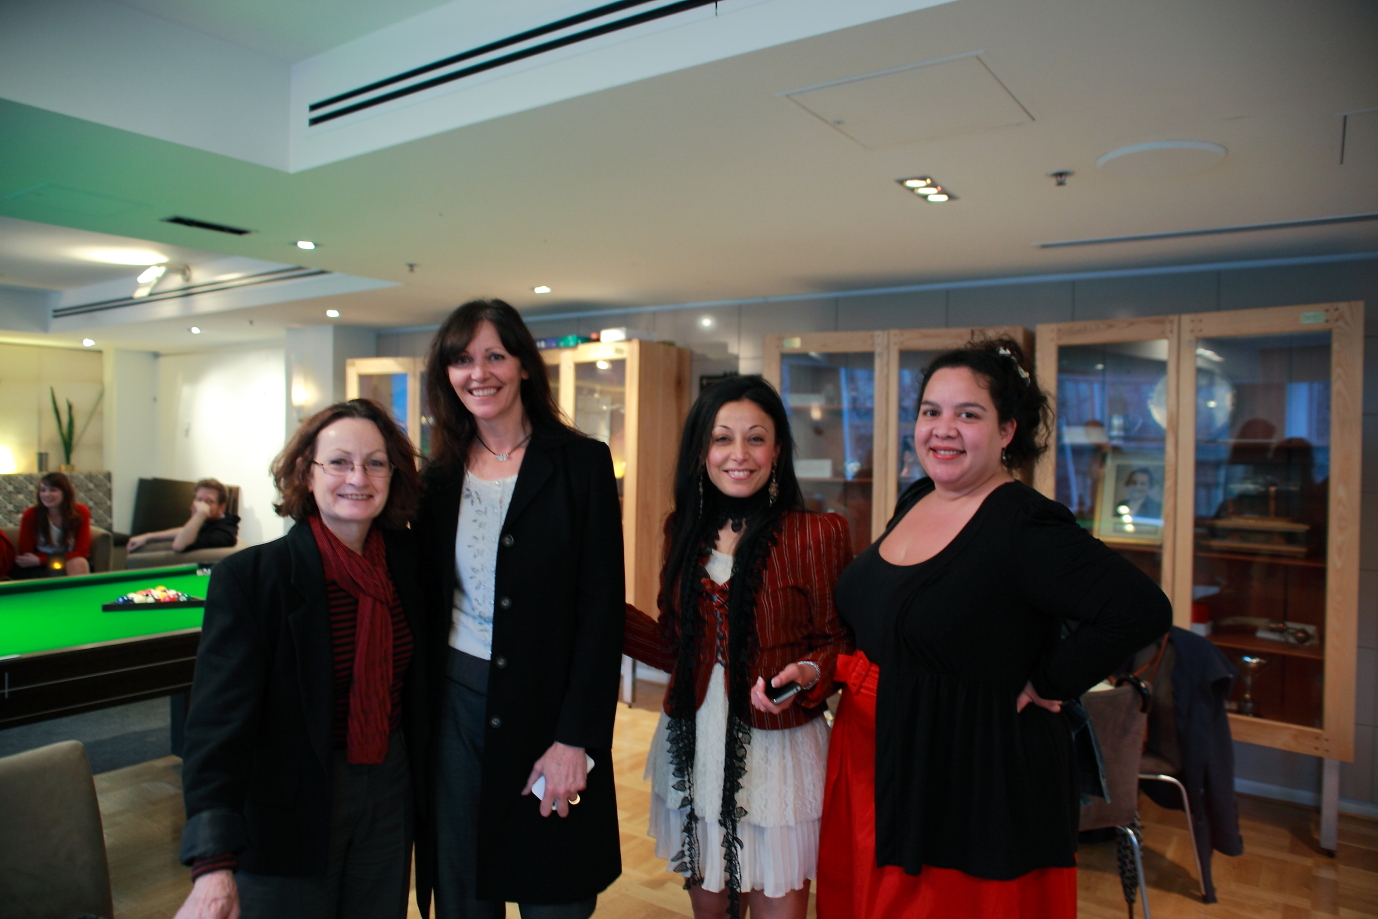 Glenys Oogjes of Animals Australia; Debra Tranter of Oscar's Law; Shatha Hamade; and Hayley Barker